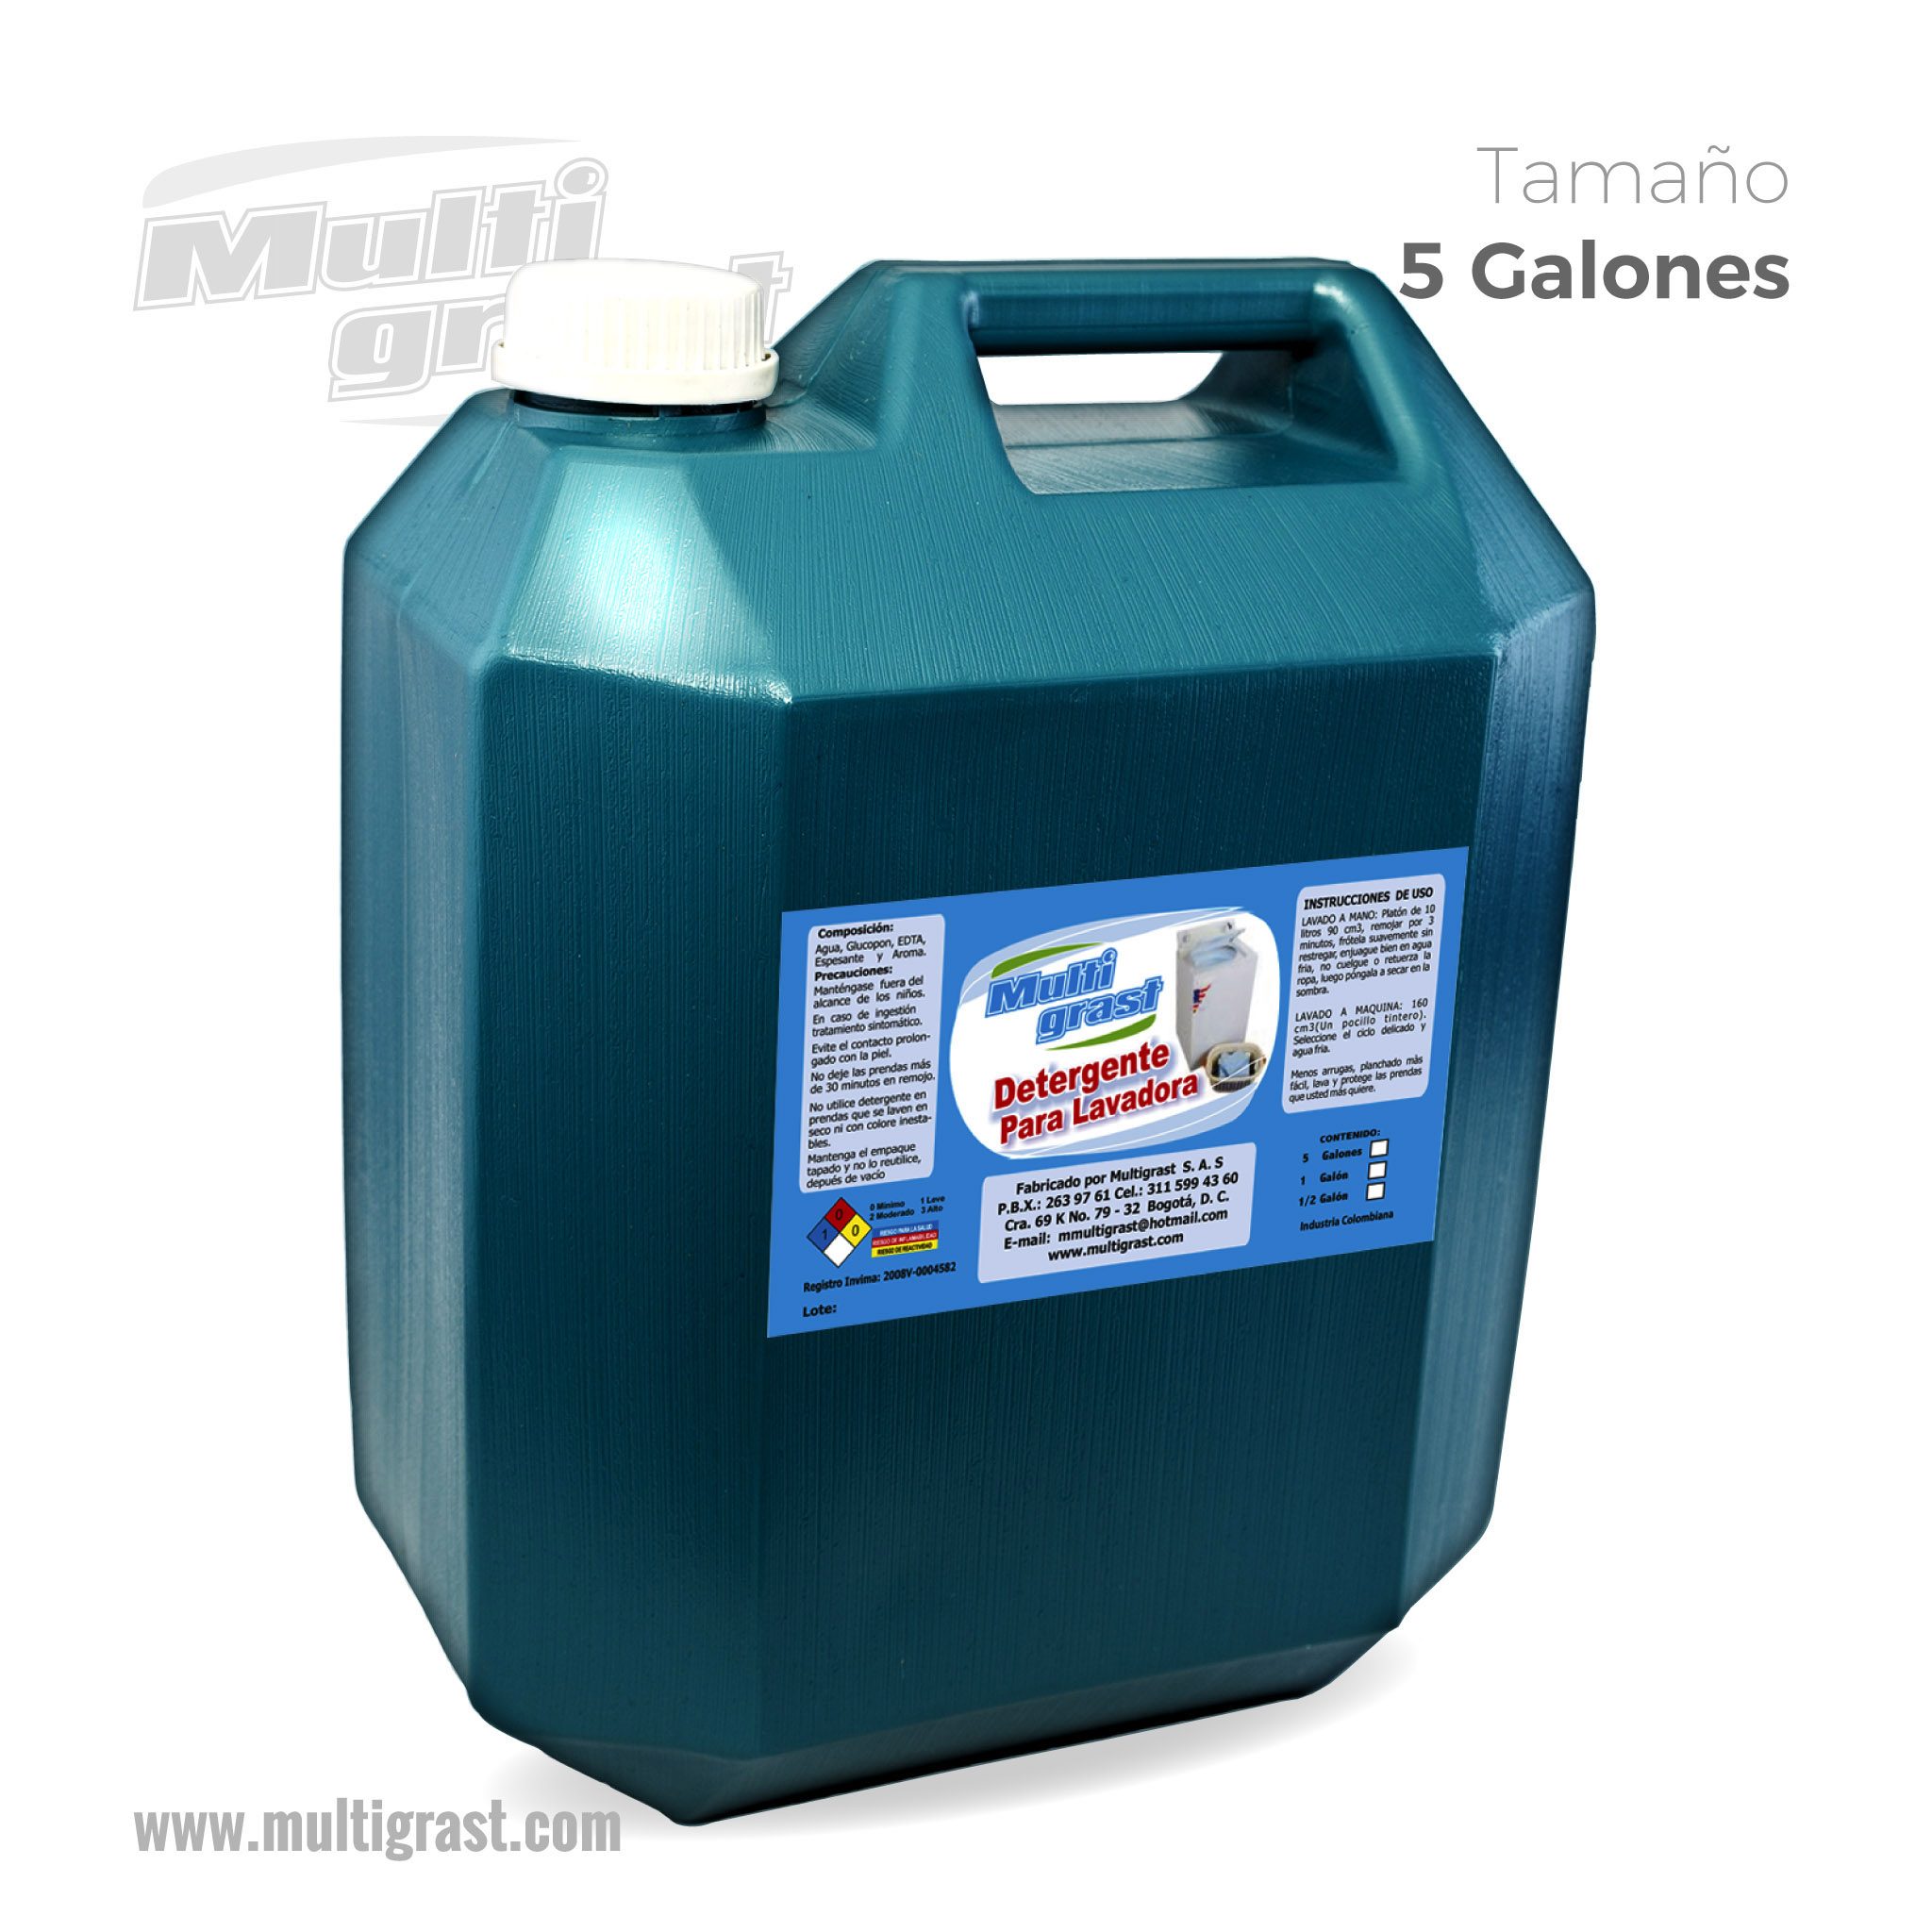 Detergente Líquido Para Lavadora Garrafa 5 Galones